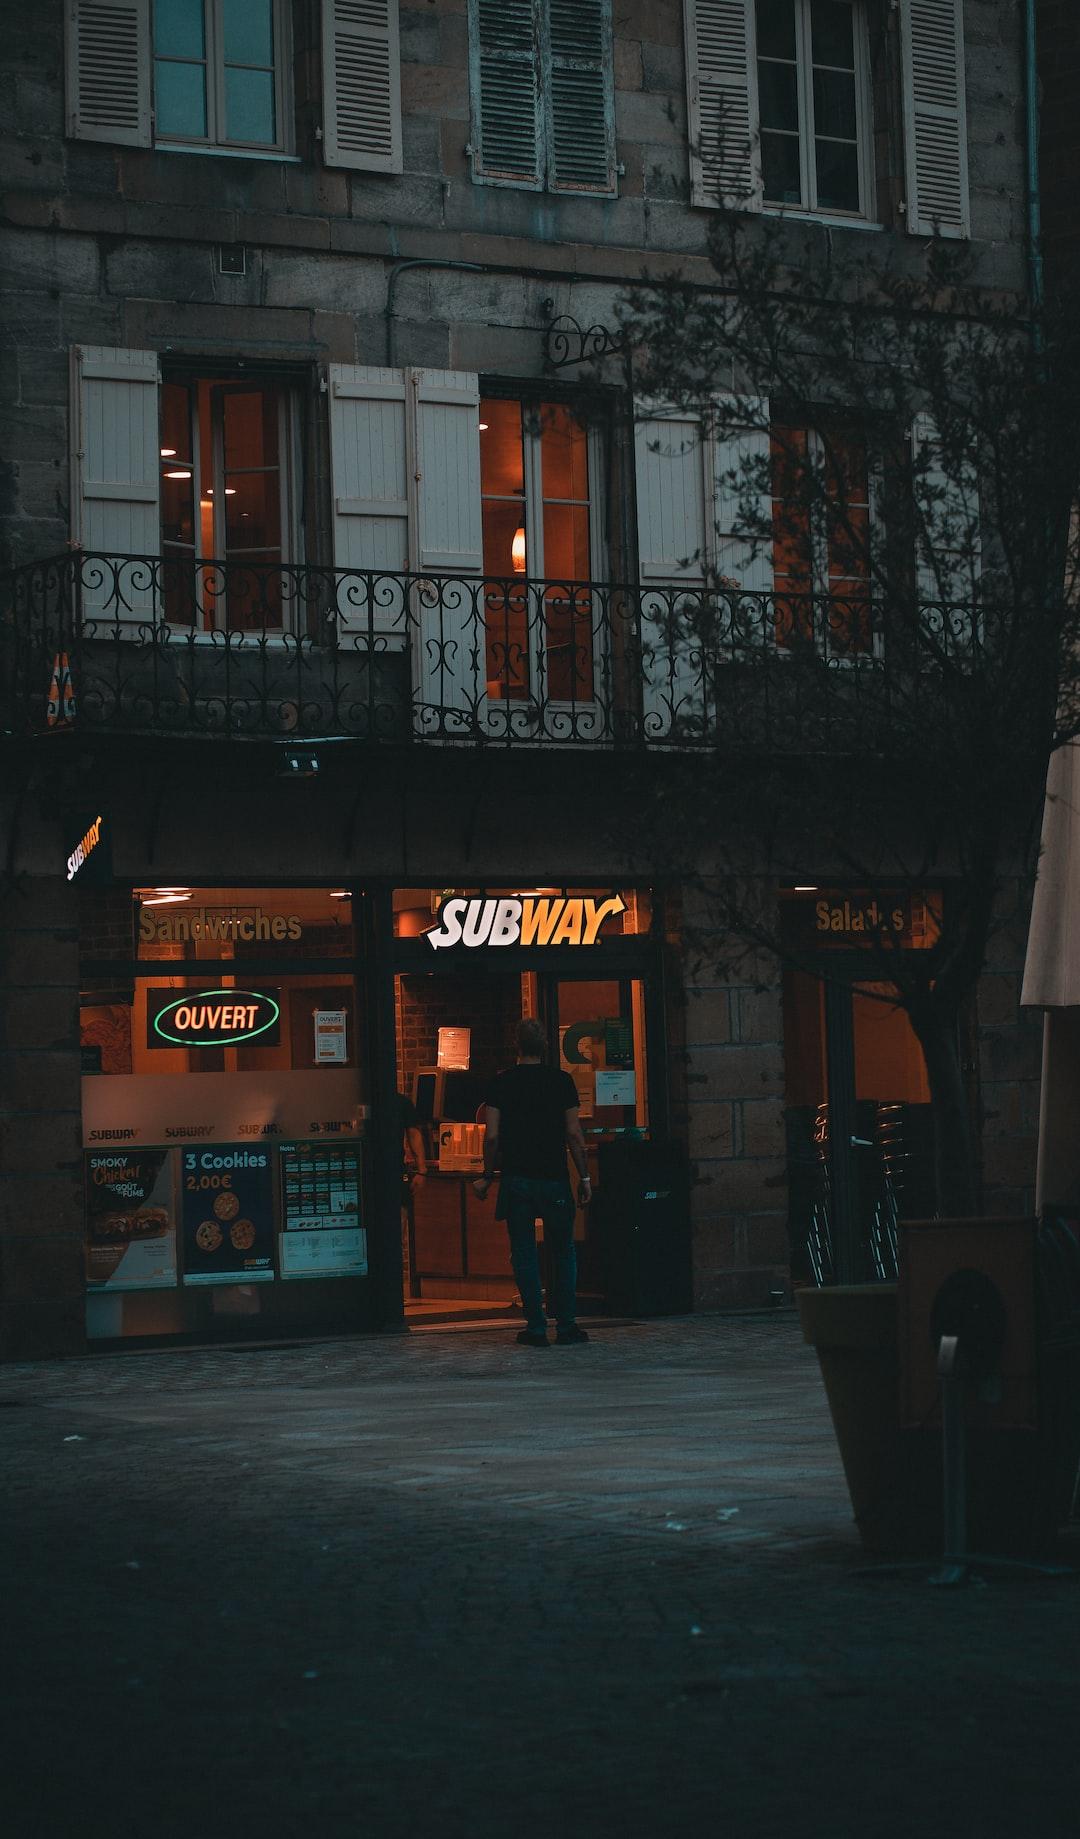 Subway vibes.🌯